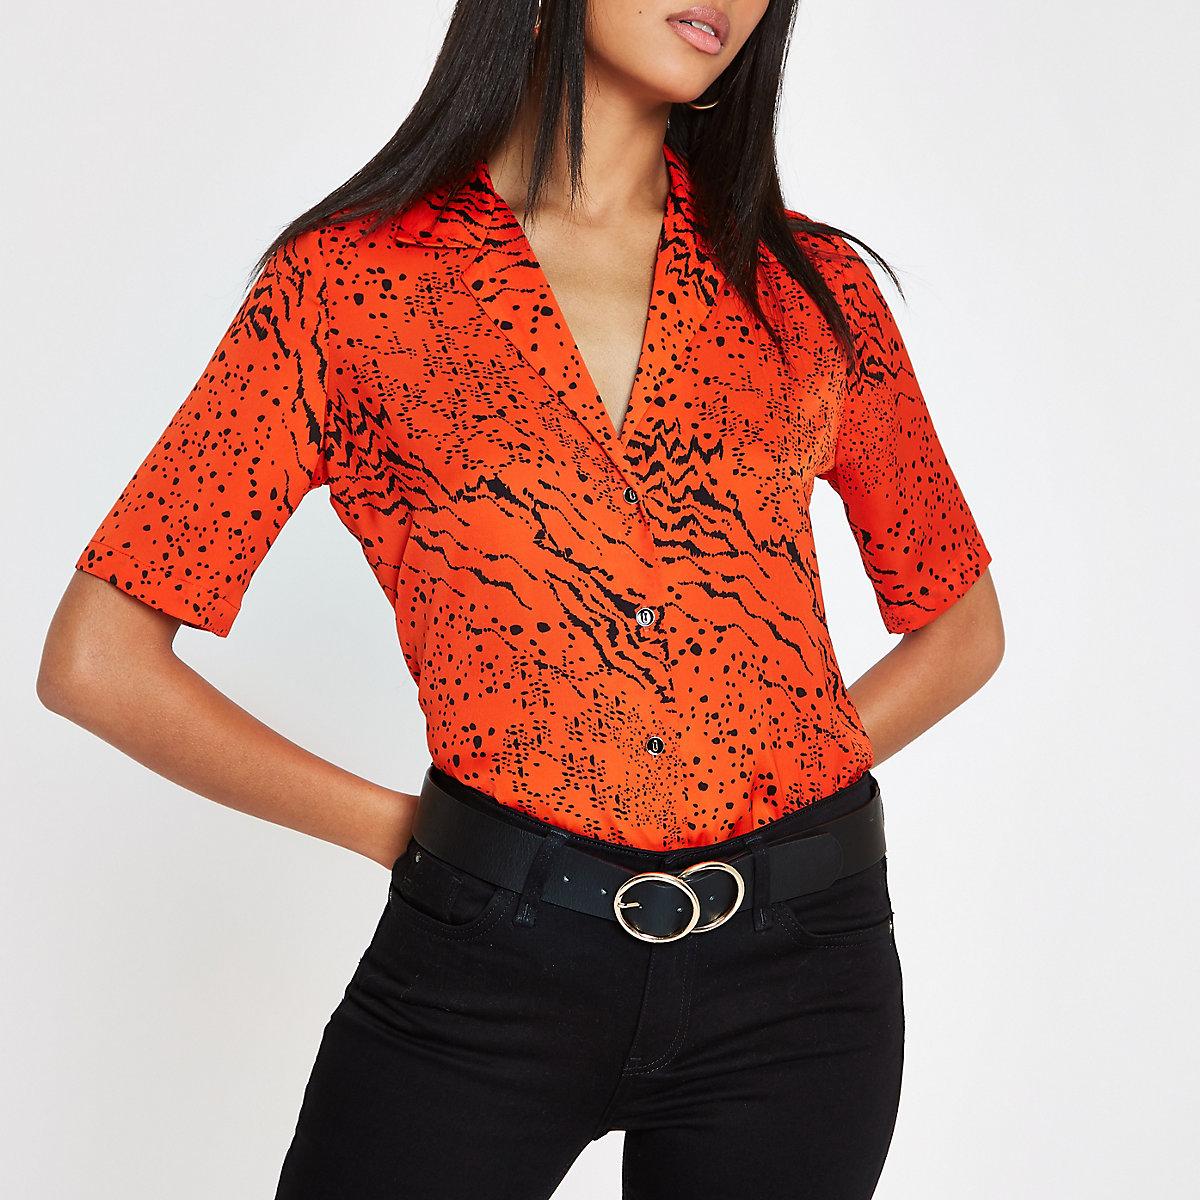 Red animal print short sleeve shirt